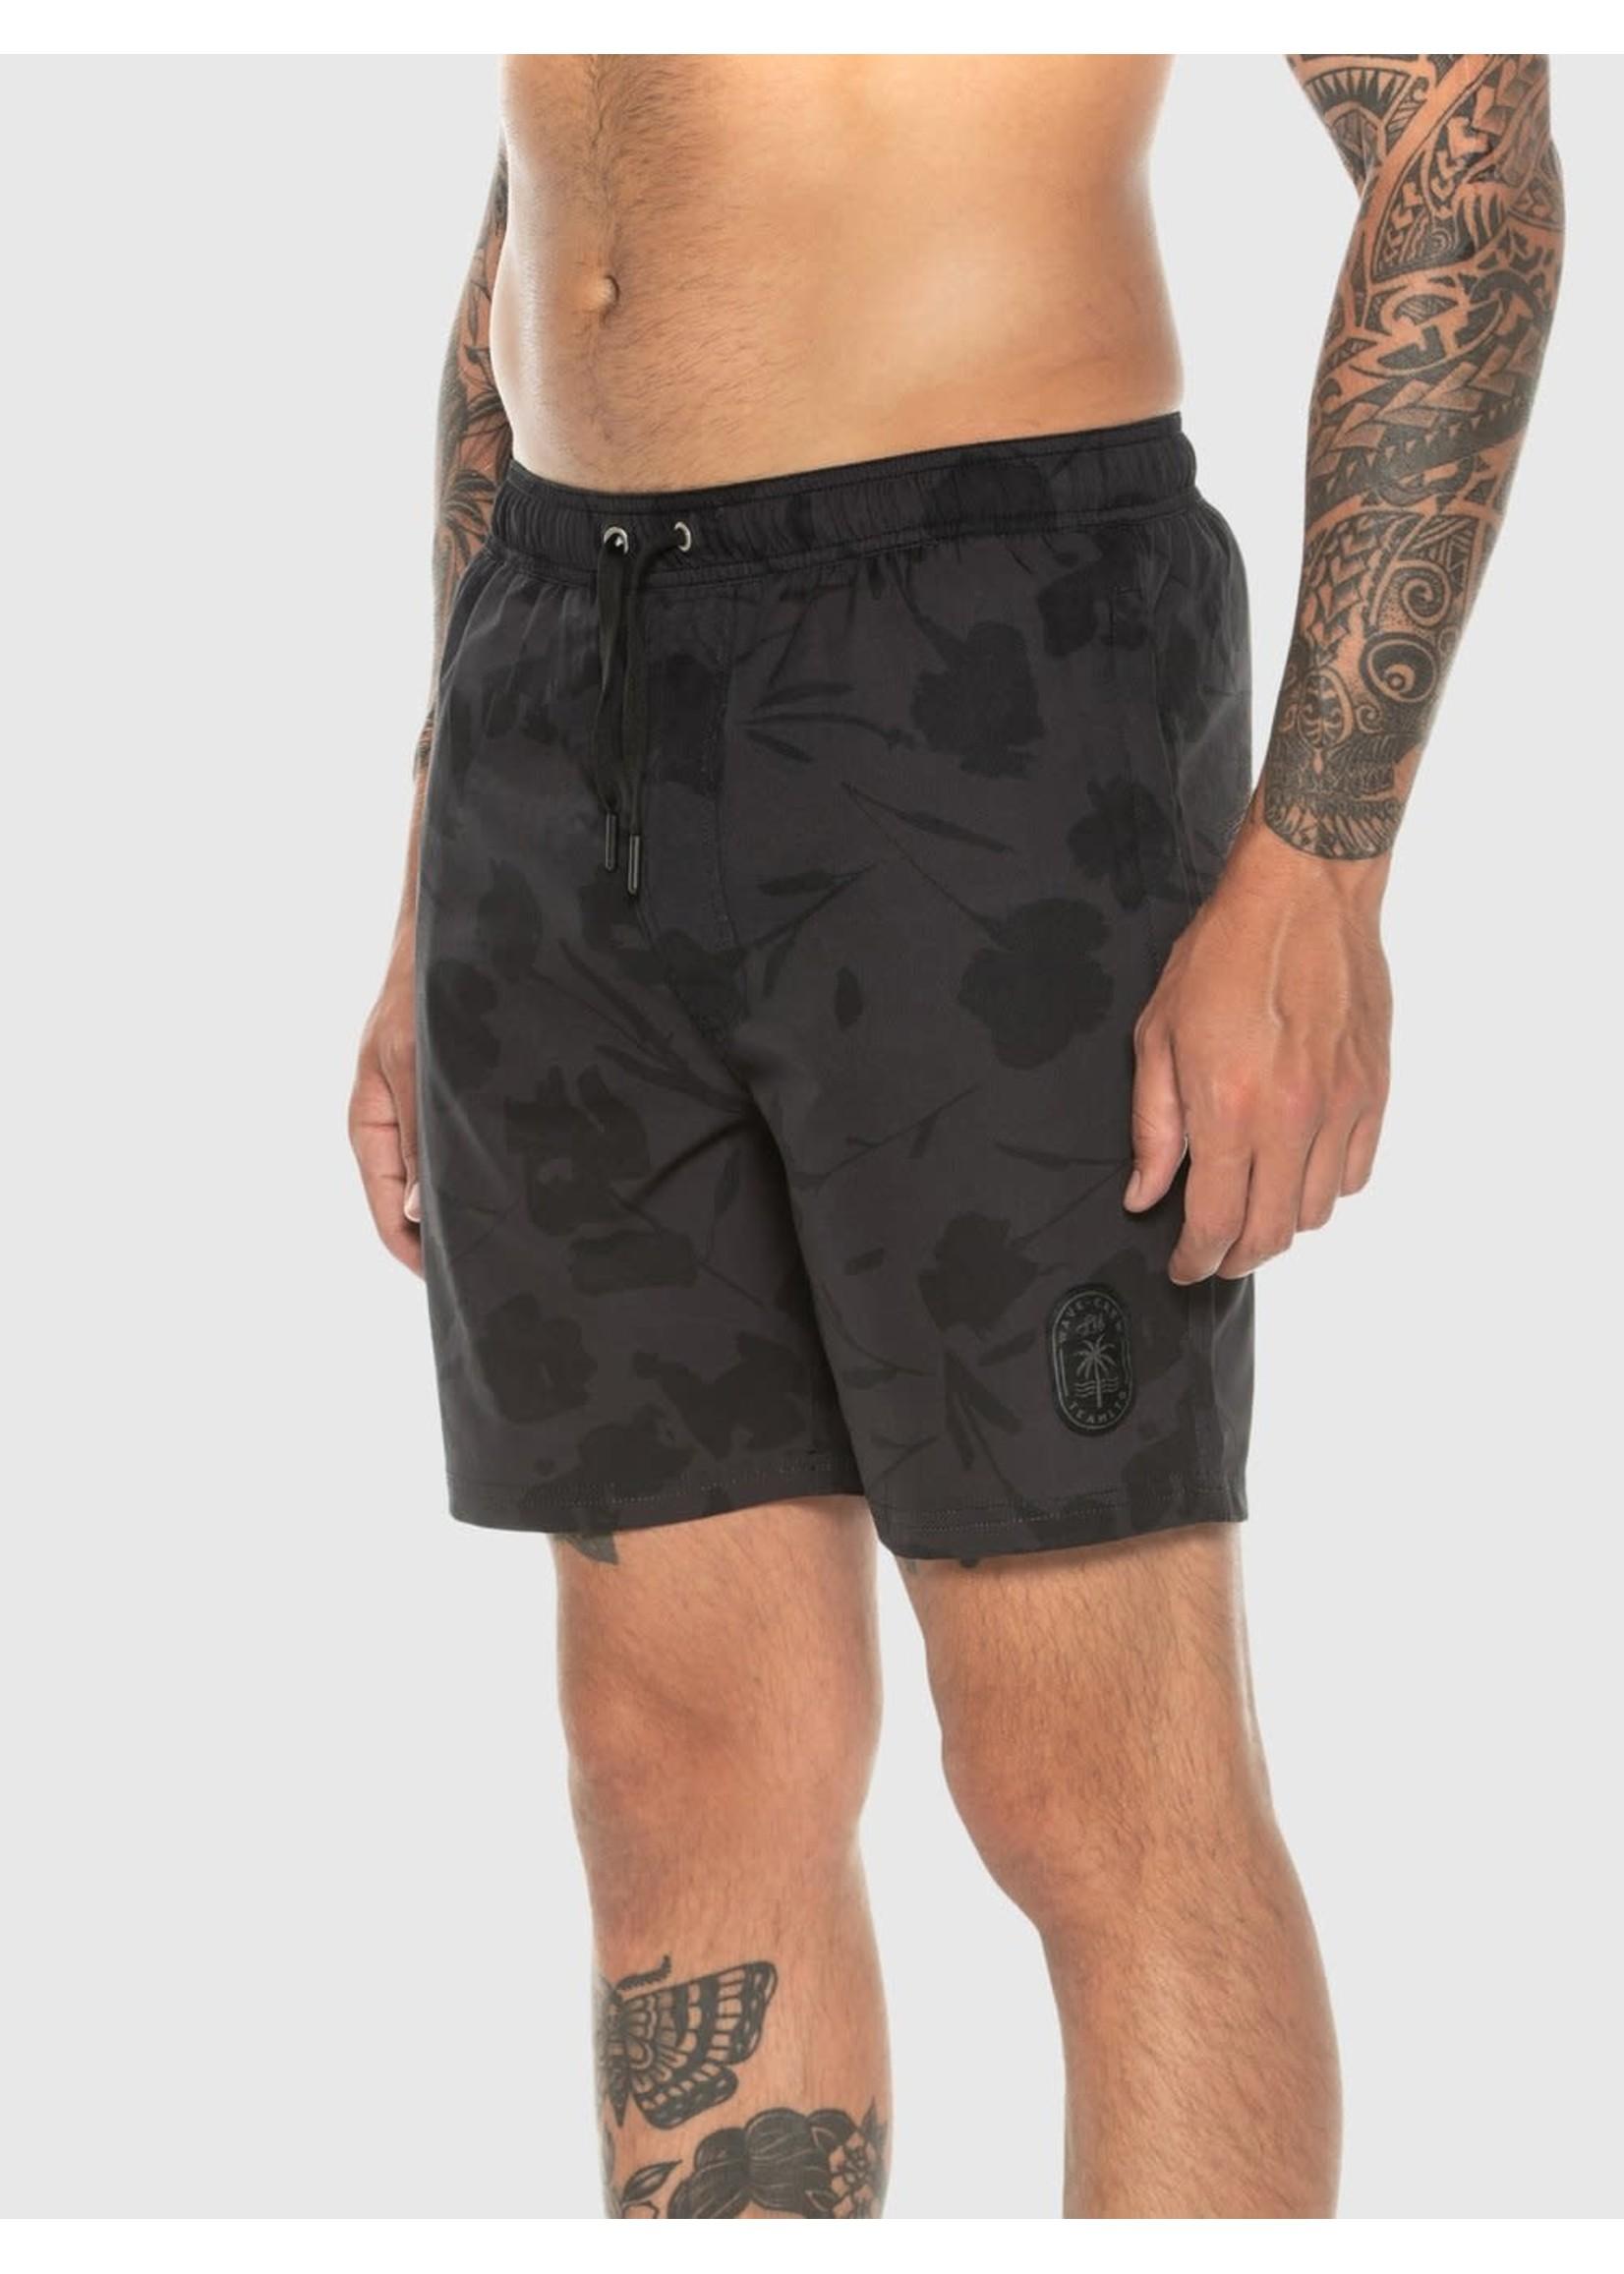 Team LTD Team LTD Silhouette Swim Shorts